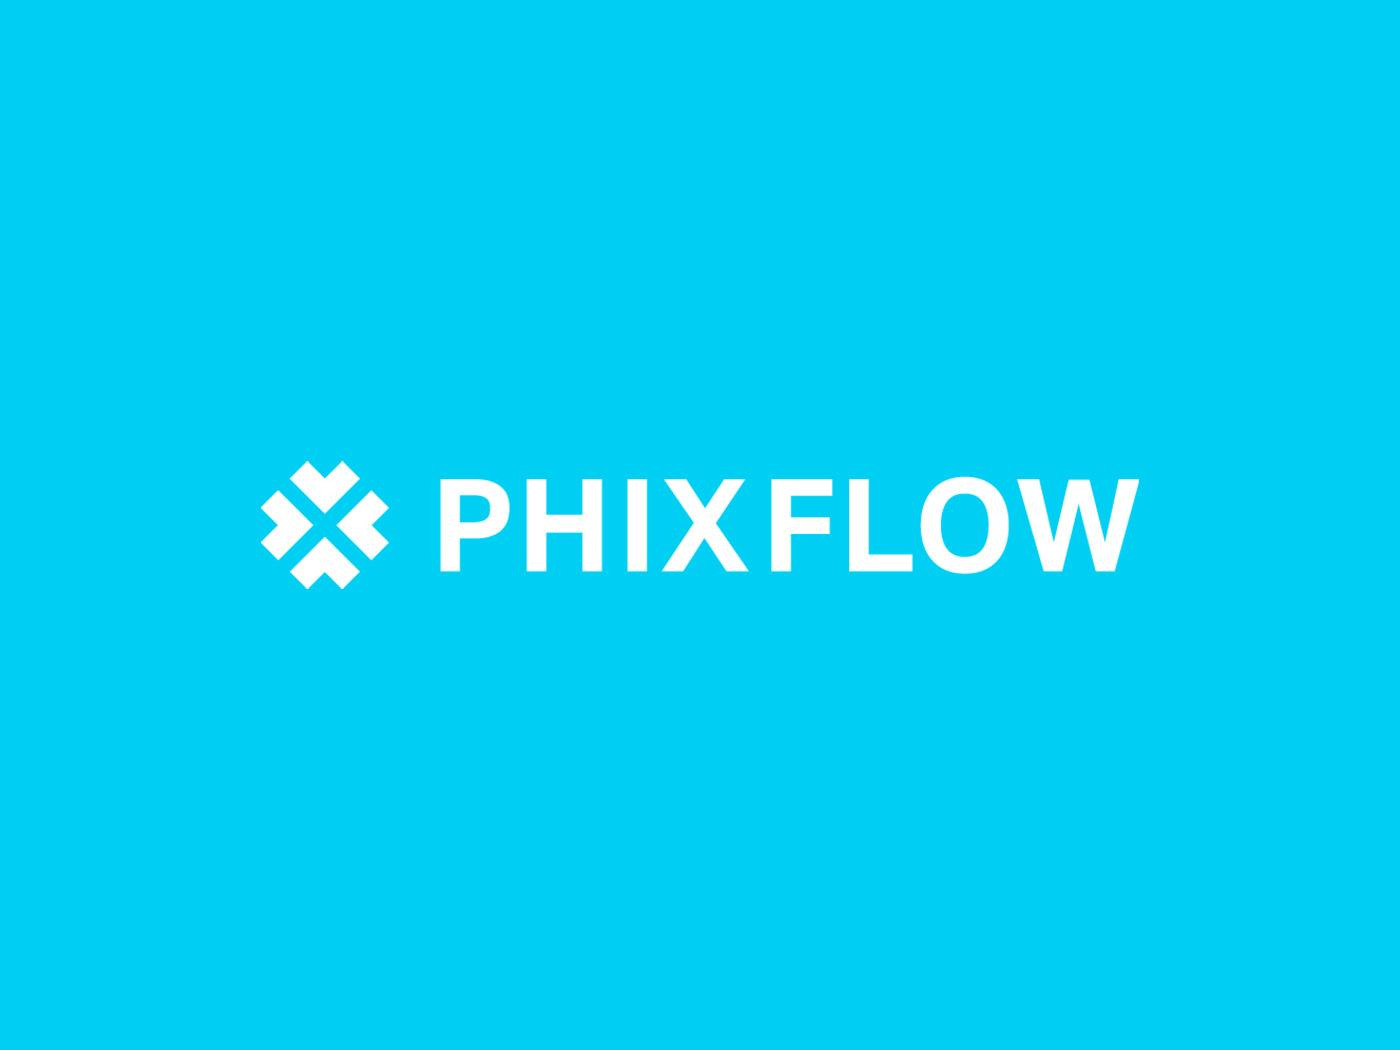 PhixFlow white washed brand, by Chiara Mensa